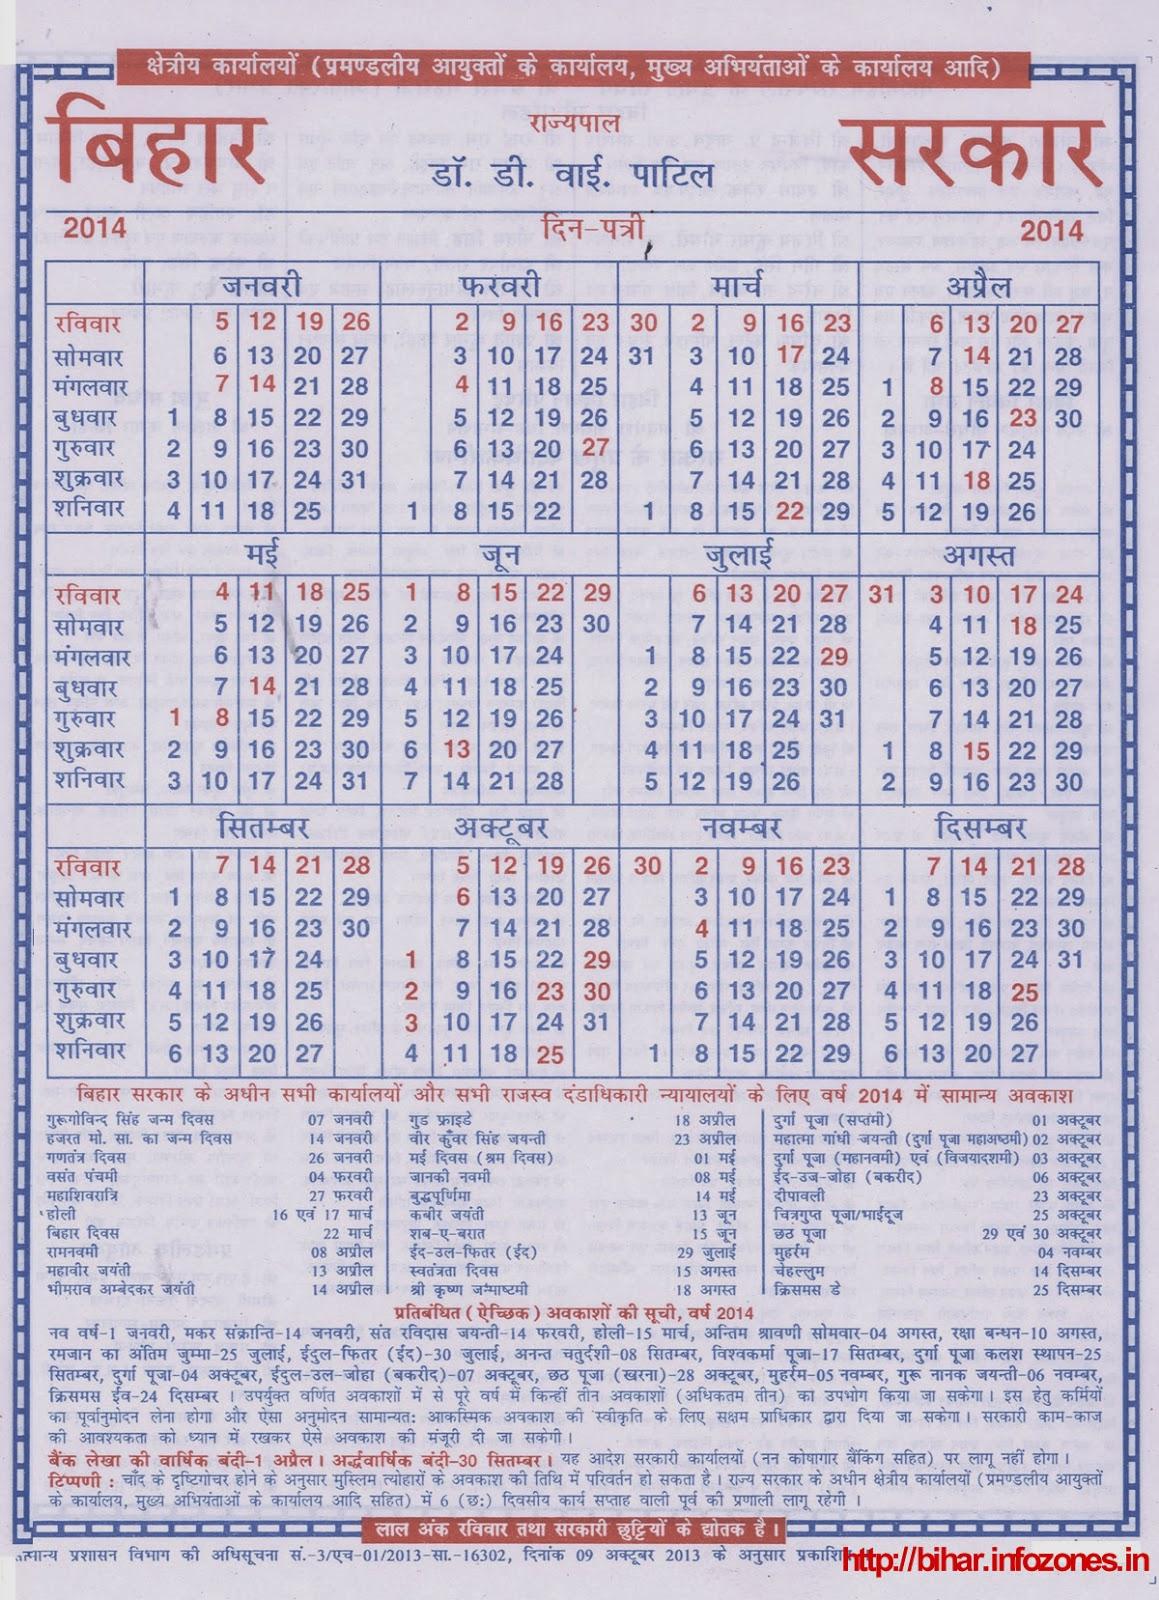 Bihar Government Calendar 2014 in Bihar Goverment Calender